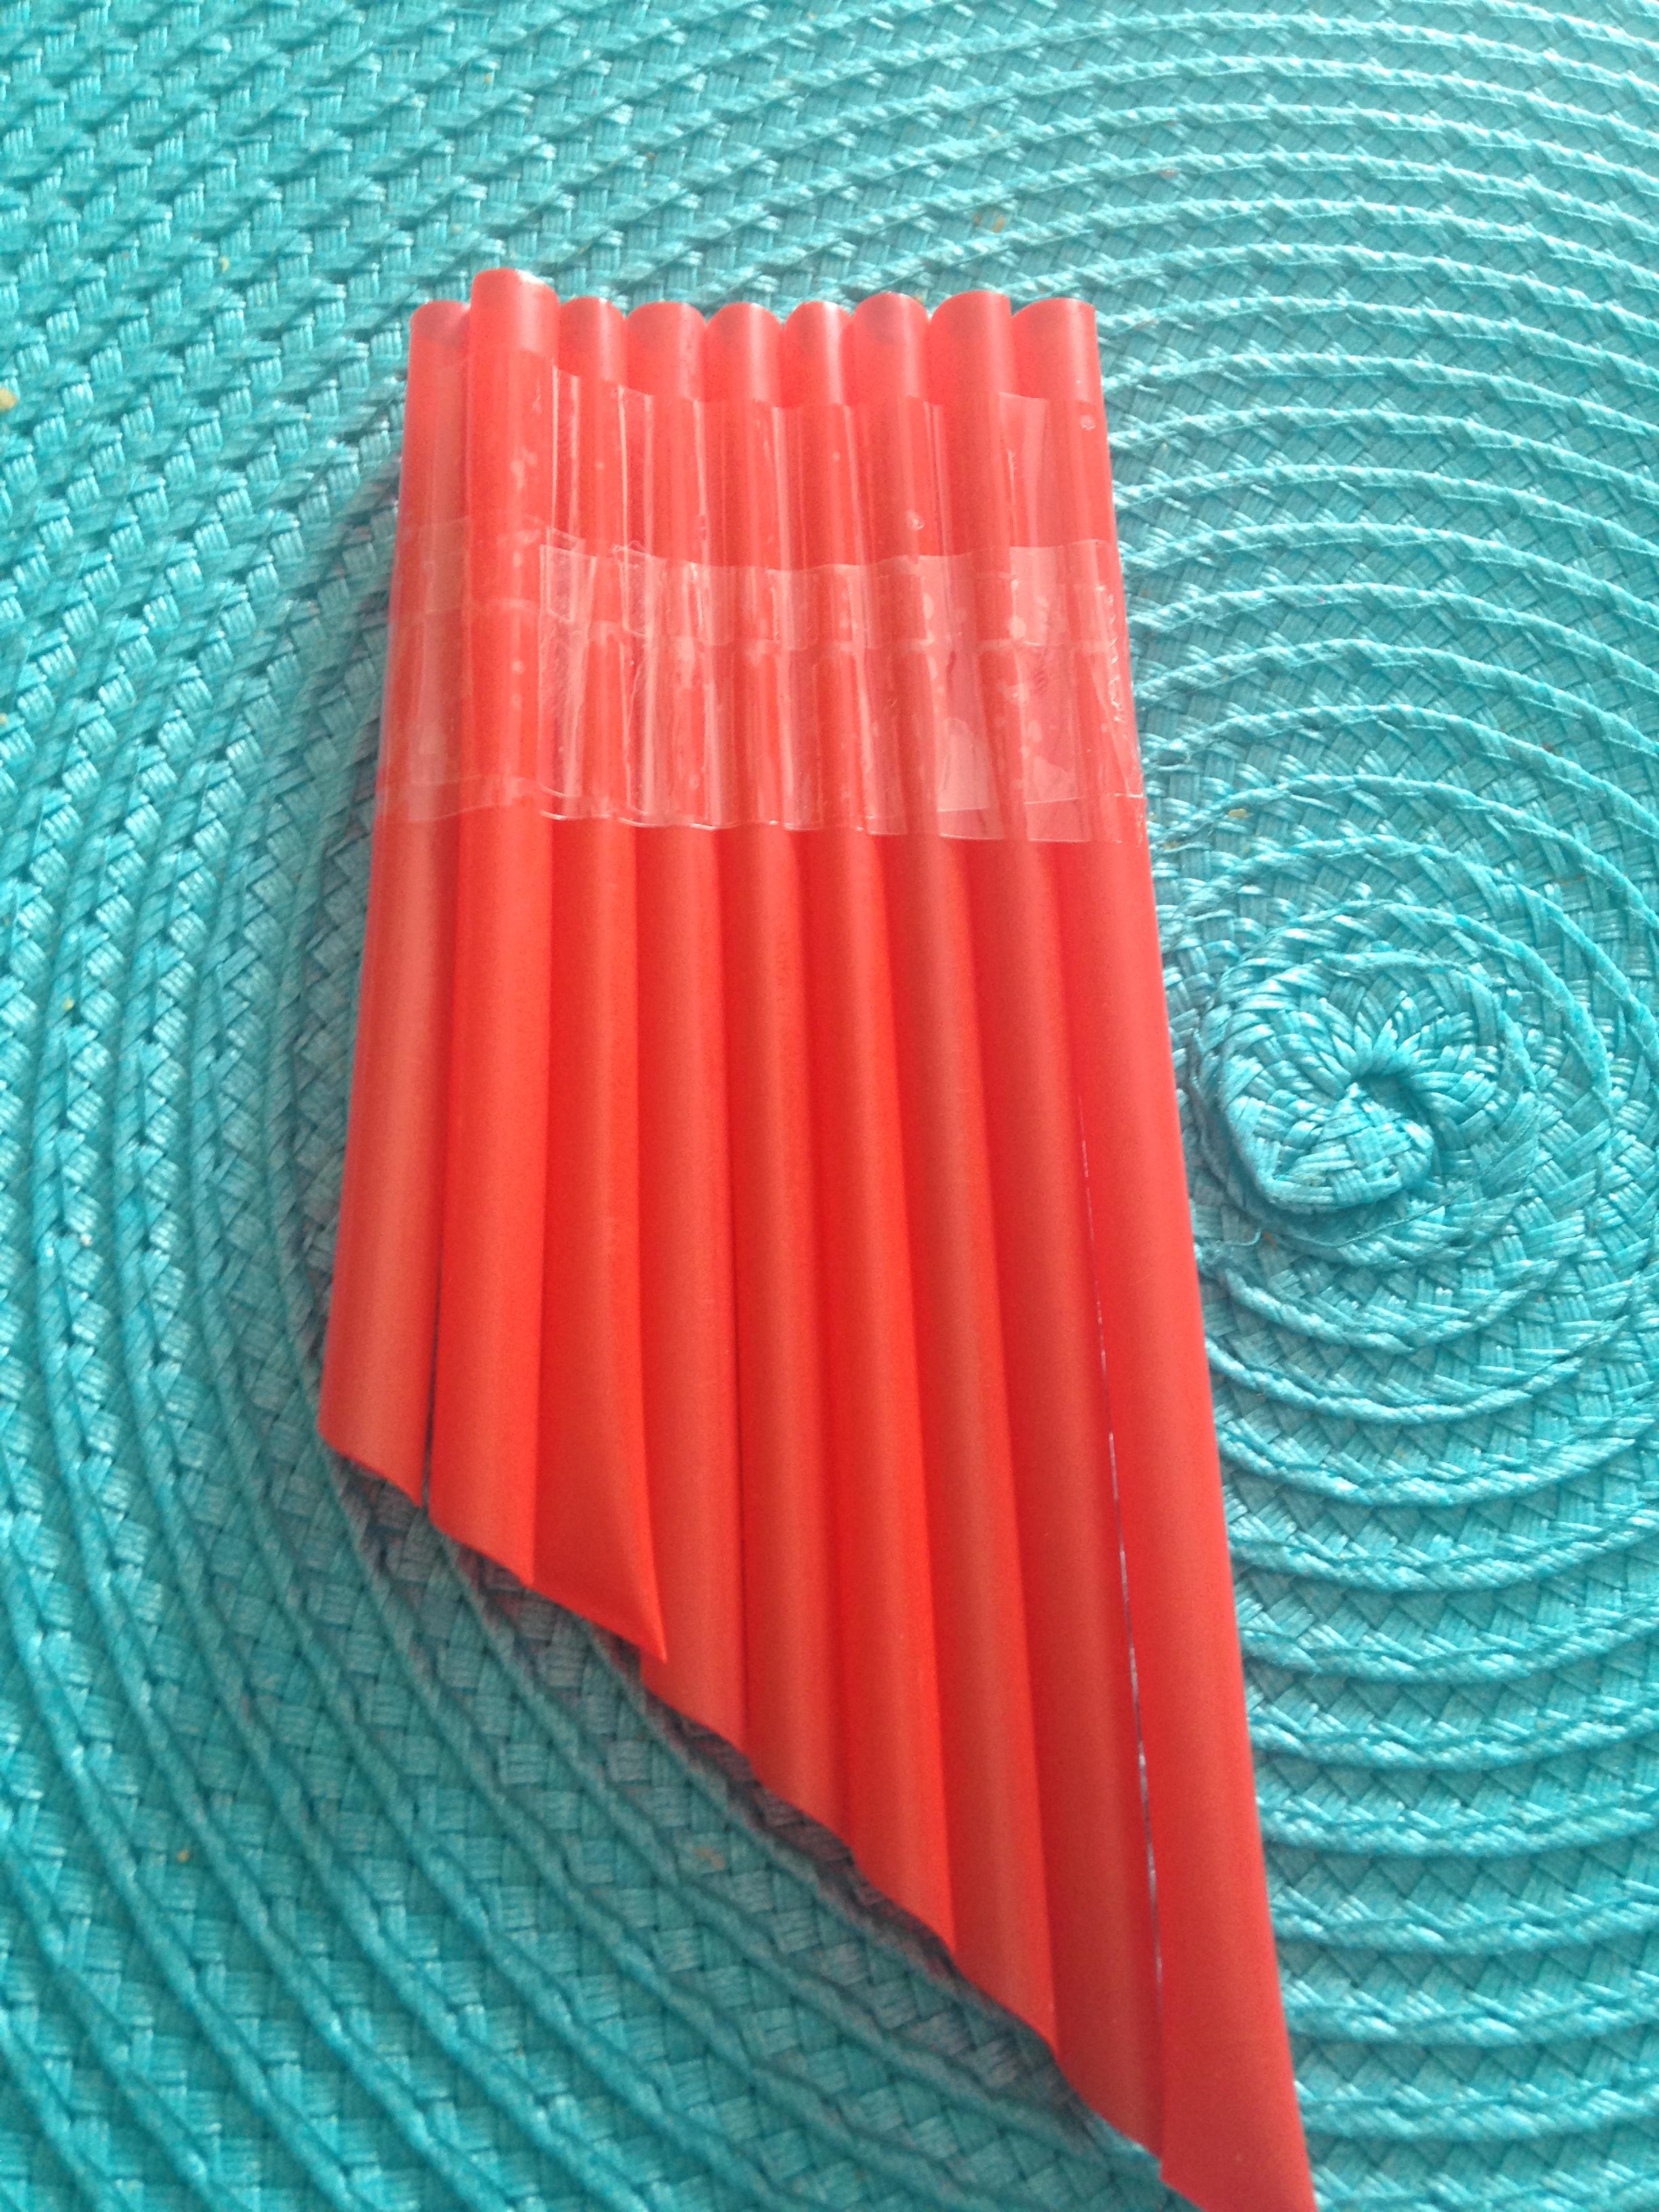 Straw Pan Flute Green Kid Crafts